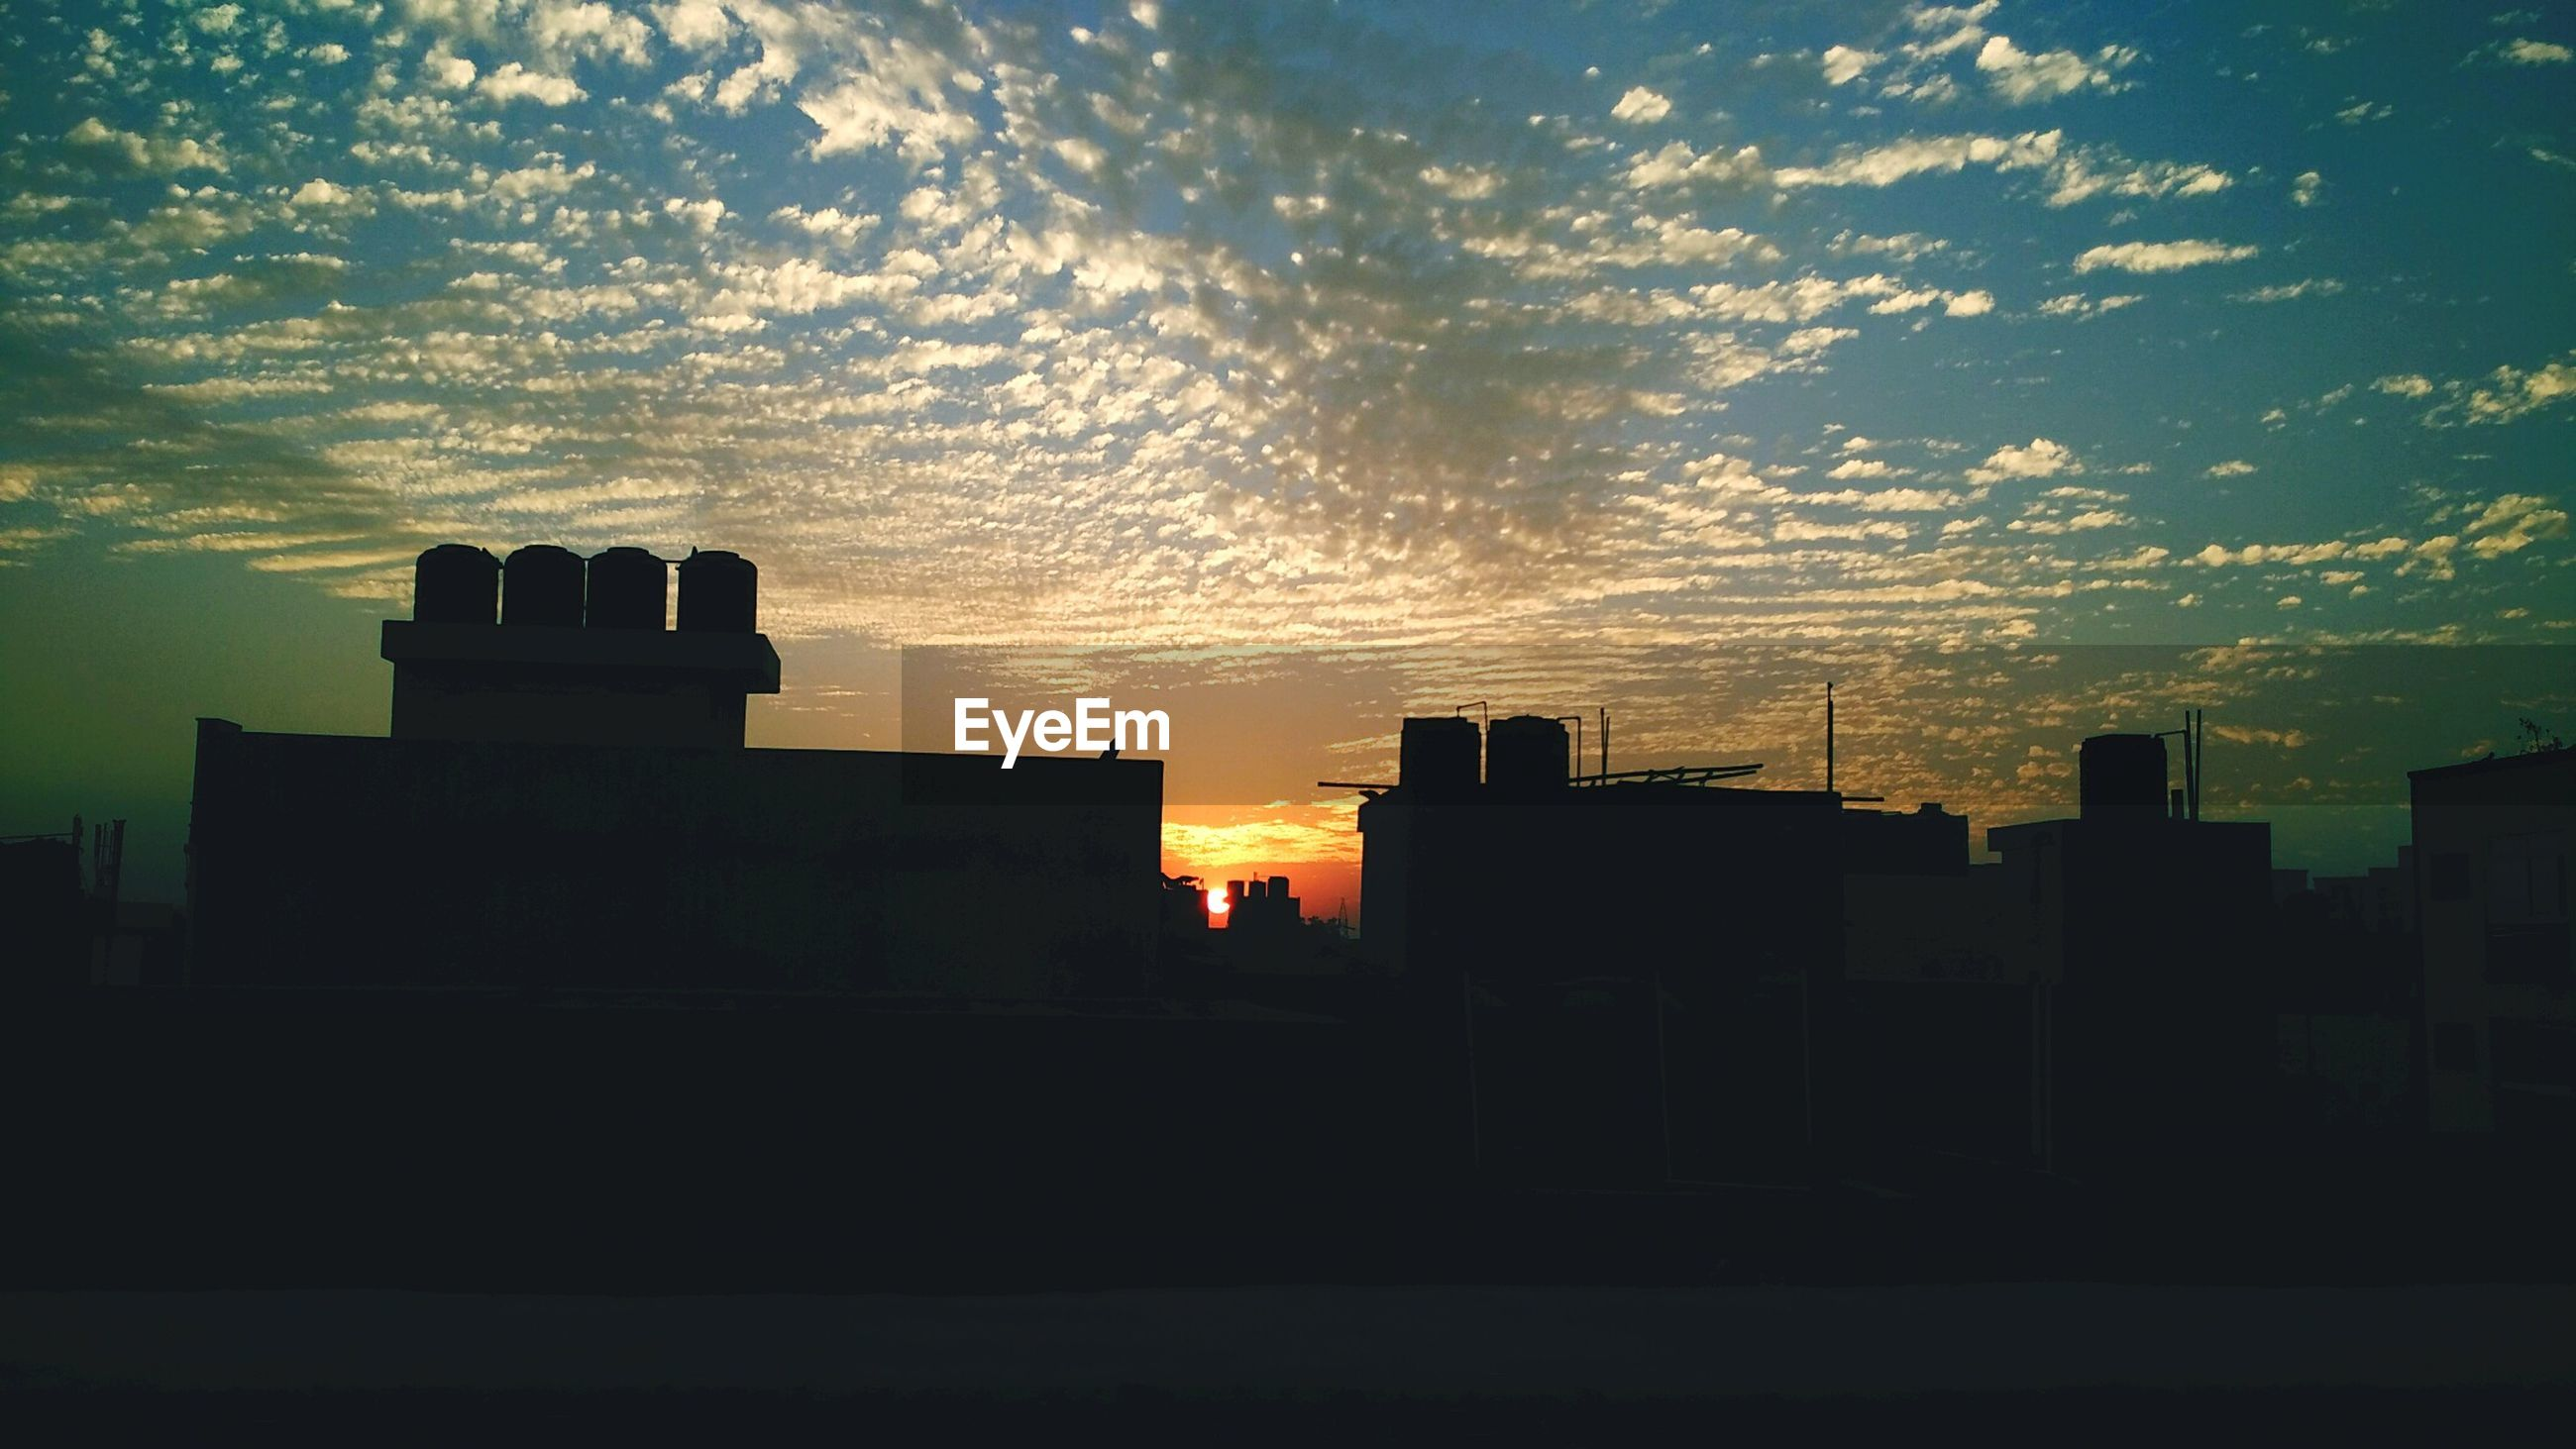 sunset, building exterior, architecture, silhouette, built structure, sky, city, cloud - sky, building, orange color, residential building, residential structure, house, dusk, cloud, dark, outdoors, no people, nature, sunlight